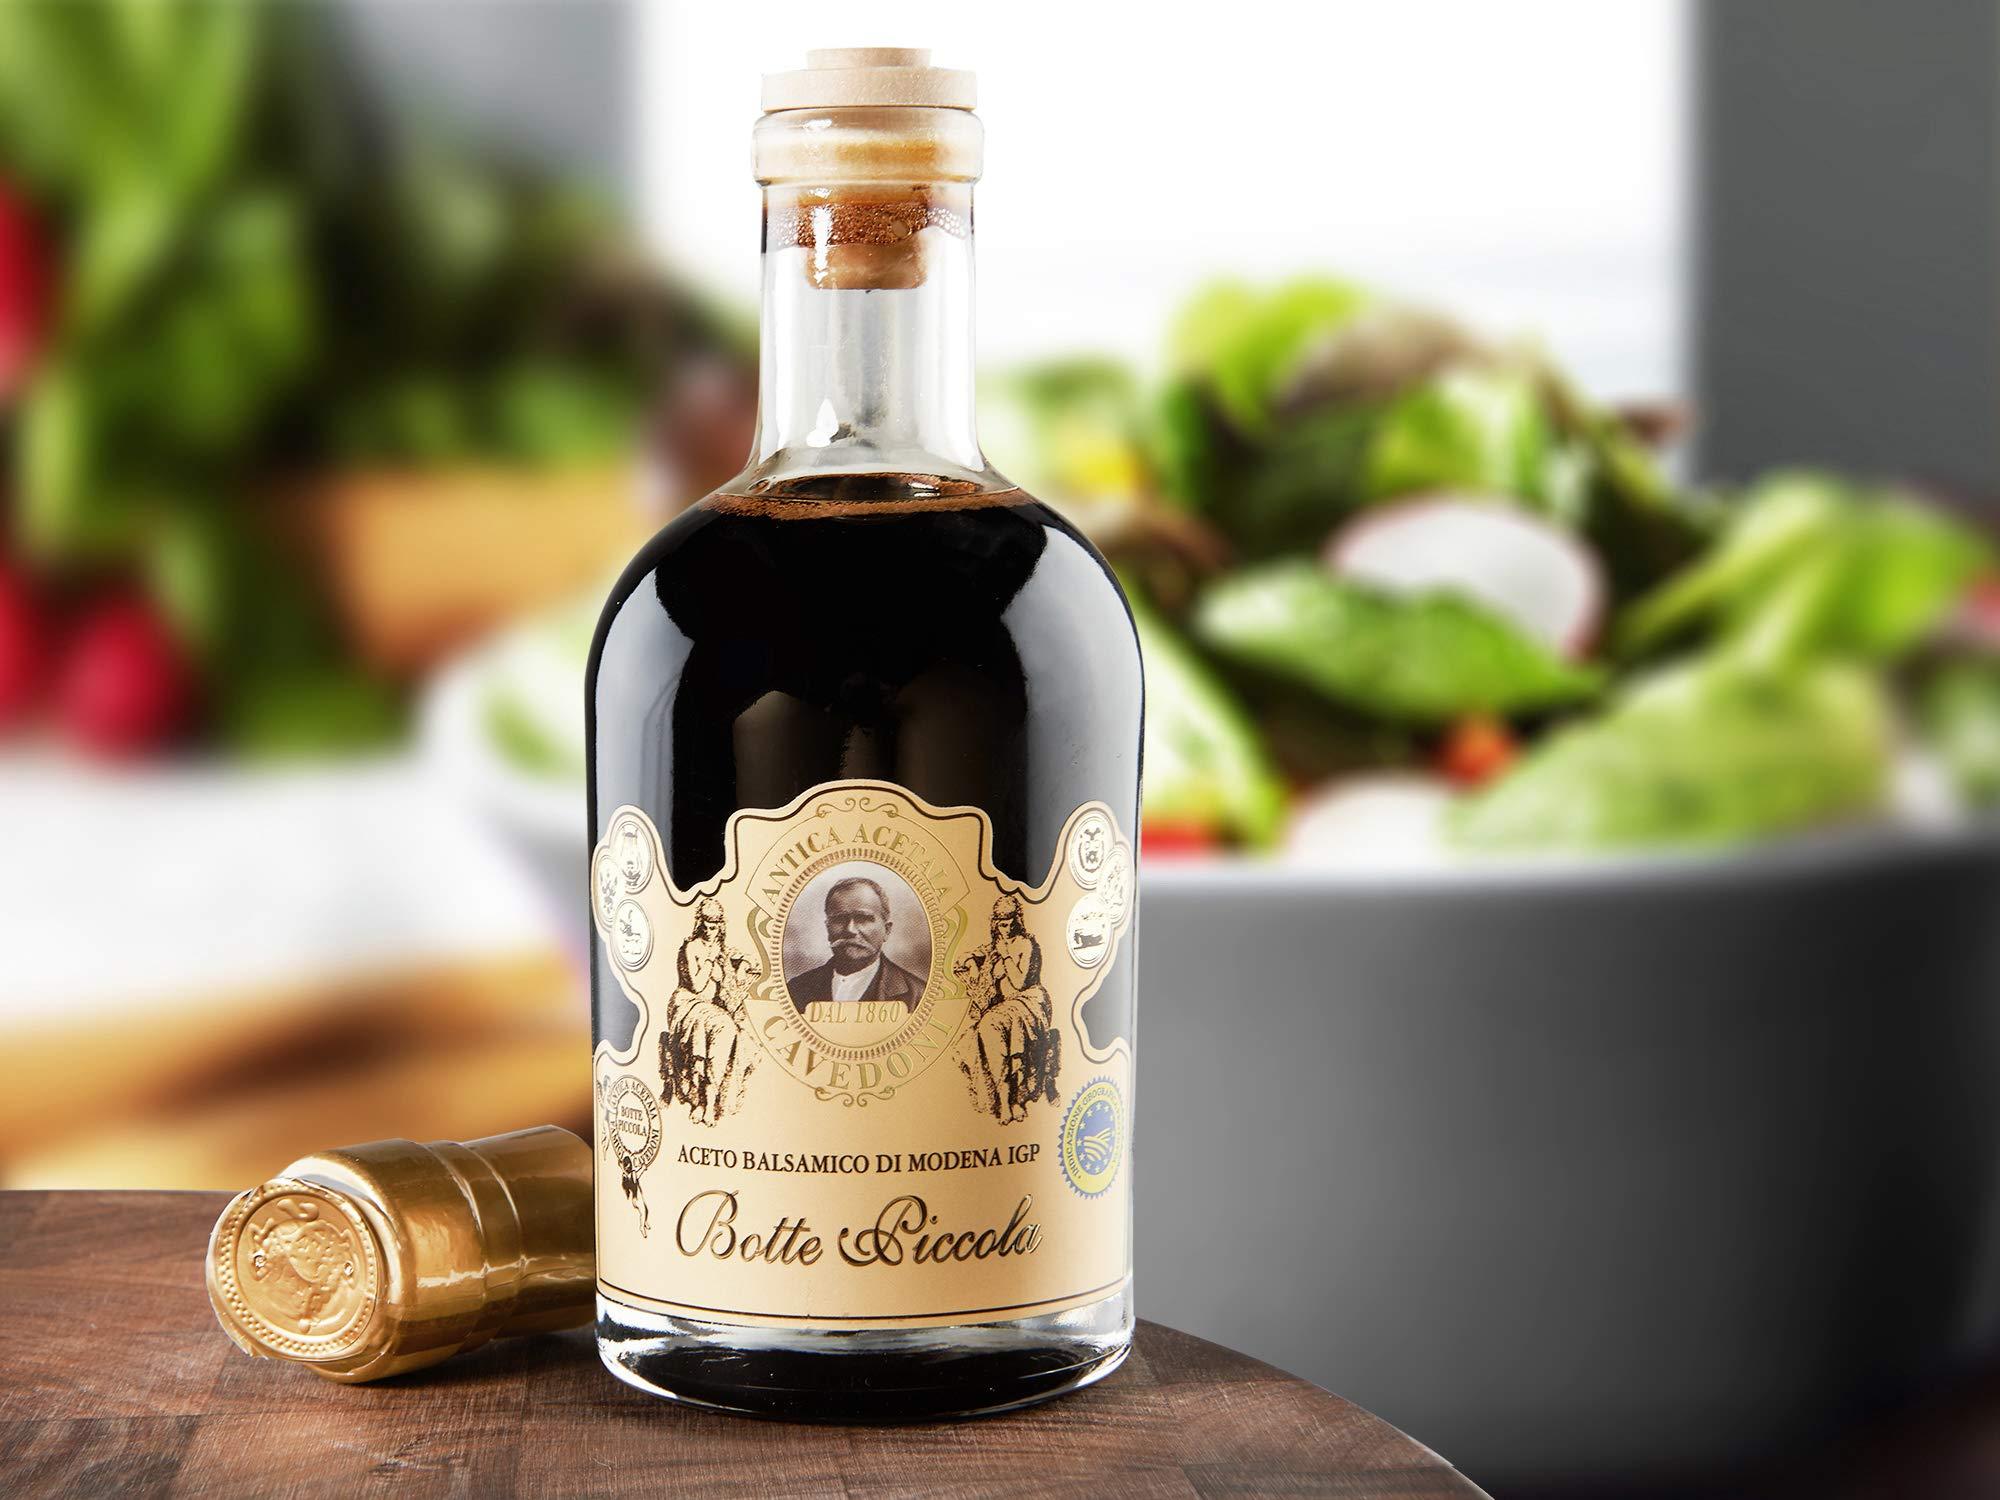 Botte Piccola Balsamic Vinegar IGP, 250ml Bottle by Cavedoni (Image #7)